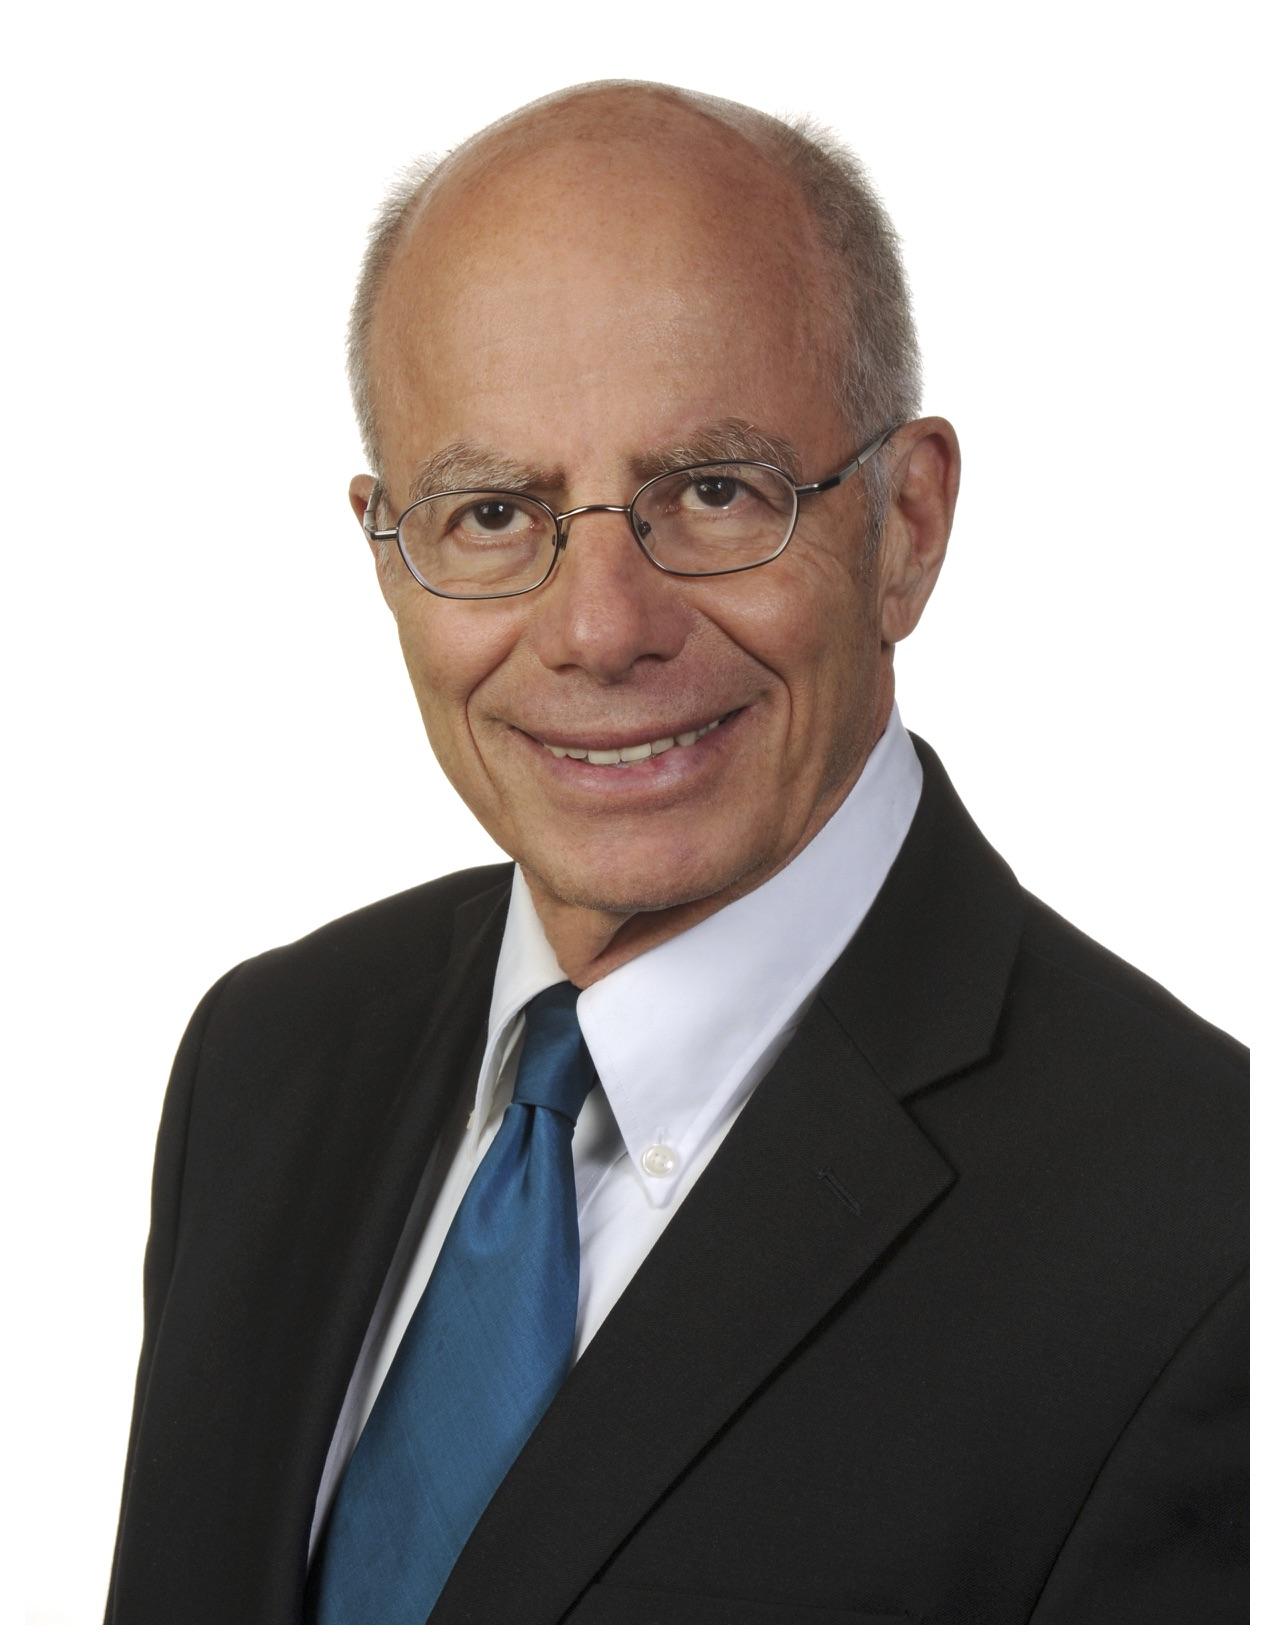 International political economy and state sovereignty expert Stephen Krasner